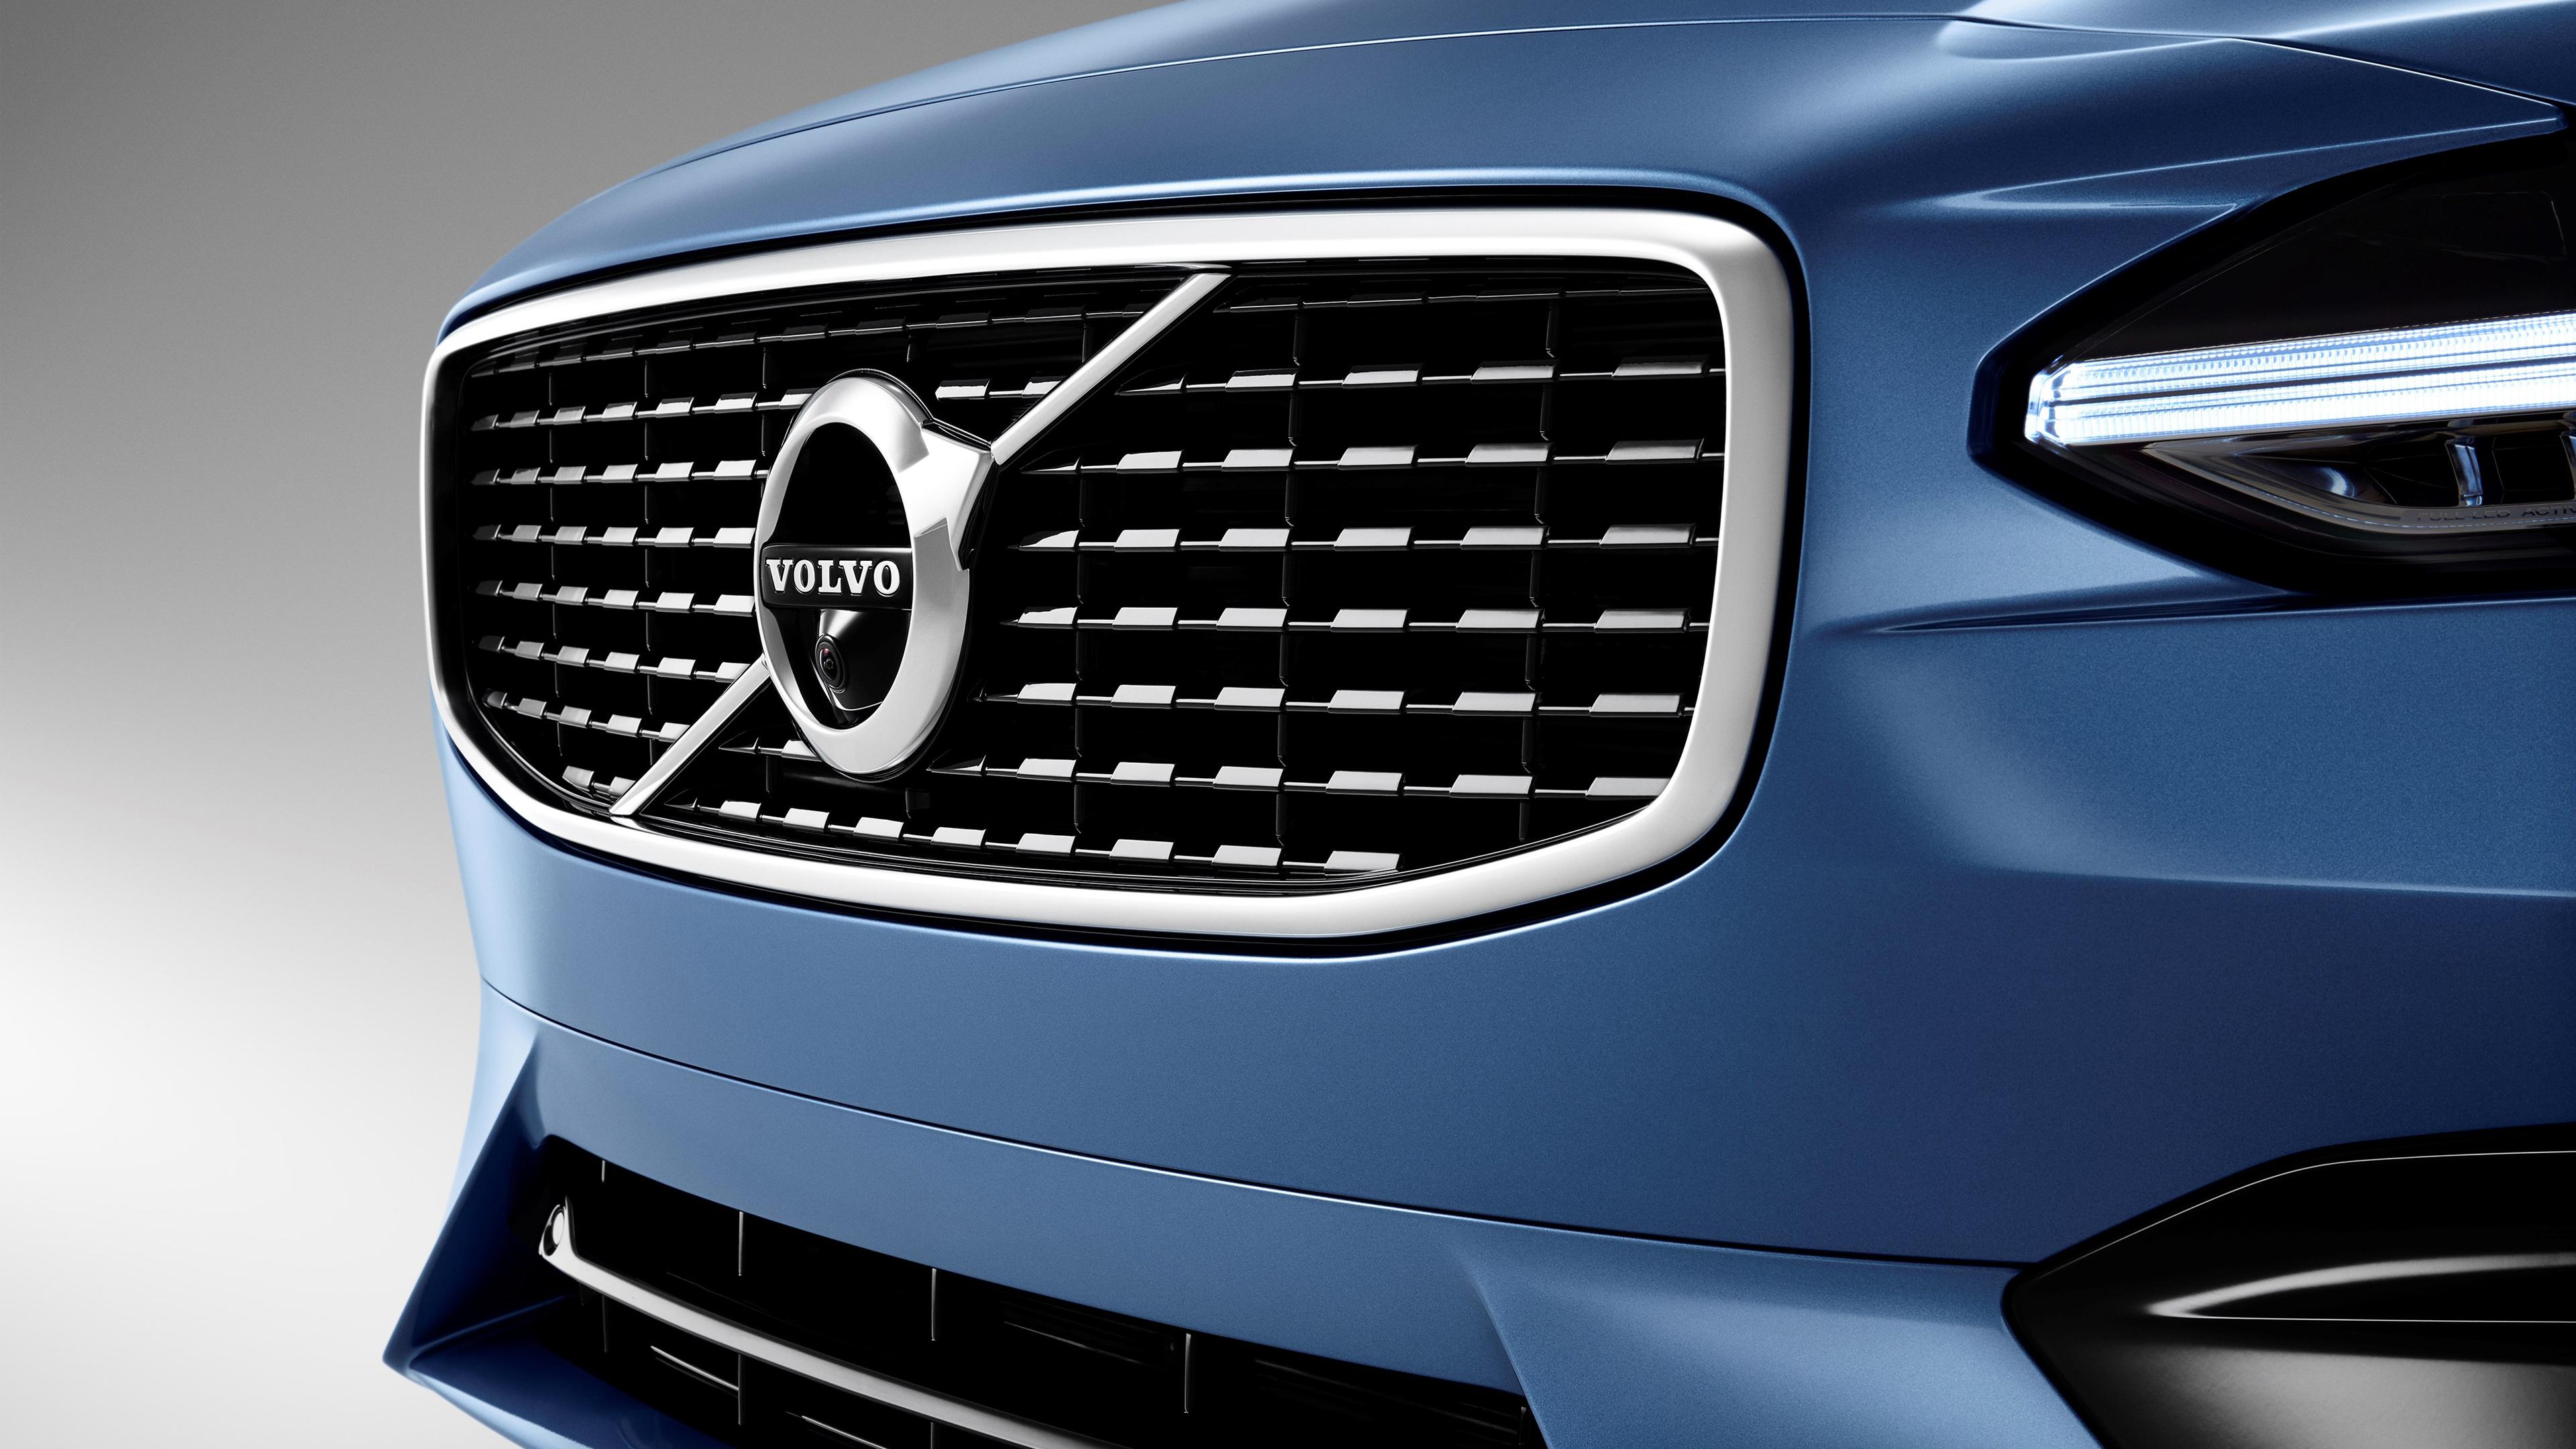 2016 Volvo V70 R 2 Wallpaper HD Car Wallpapers ID 6686 3840x2160